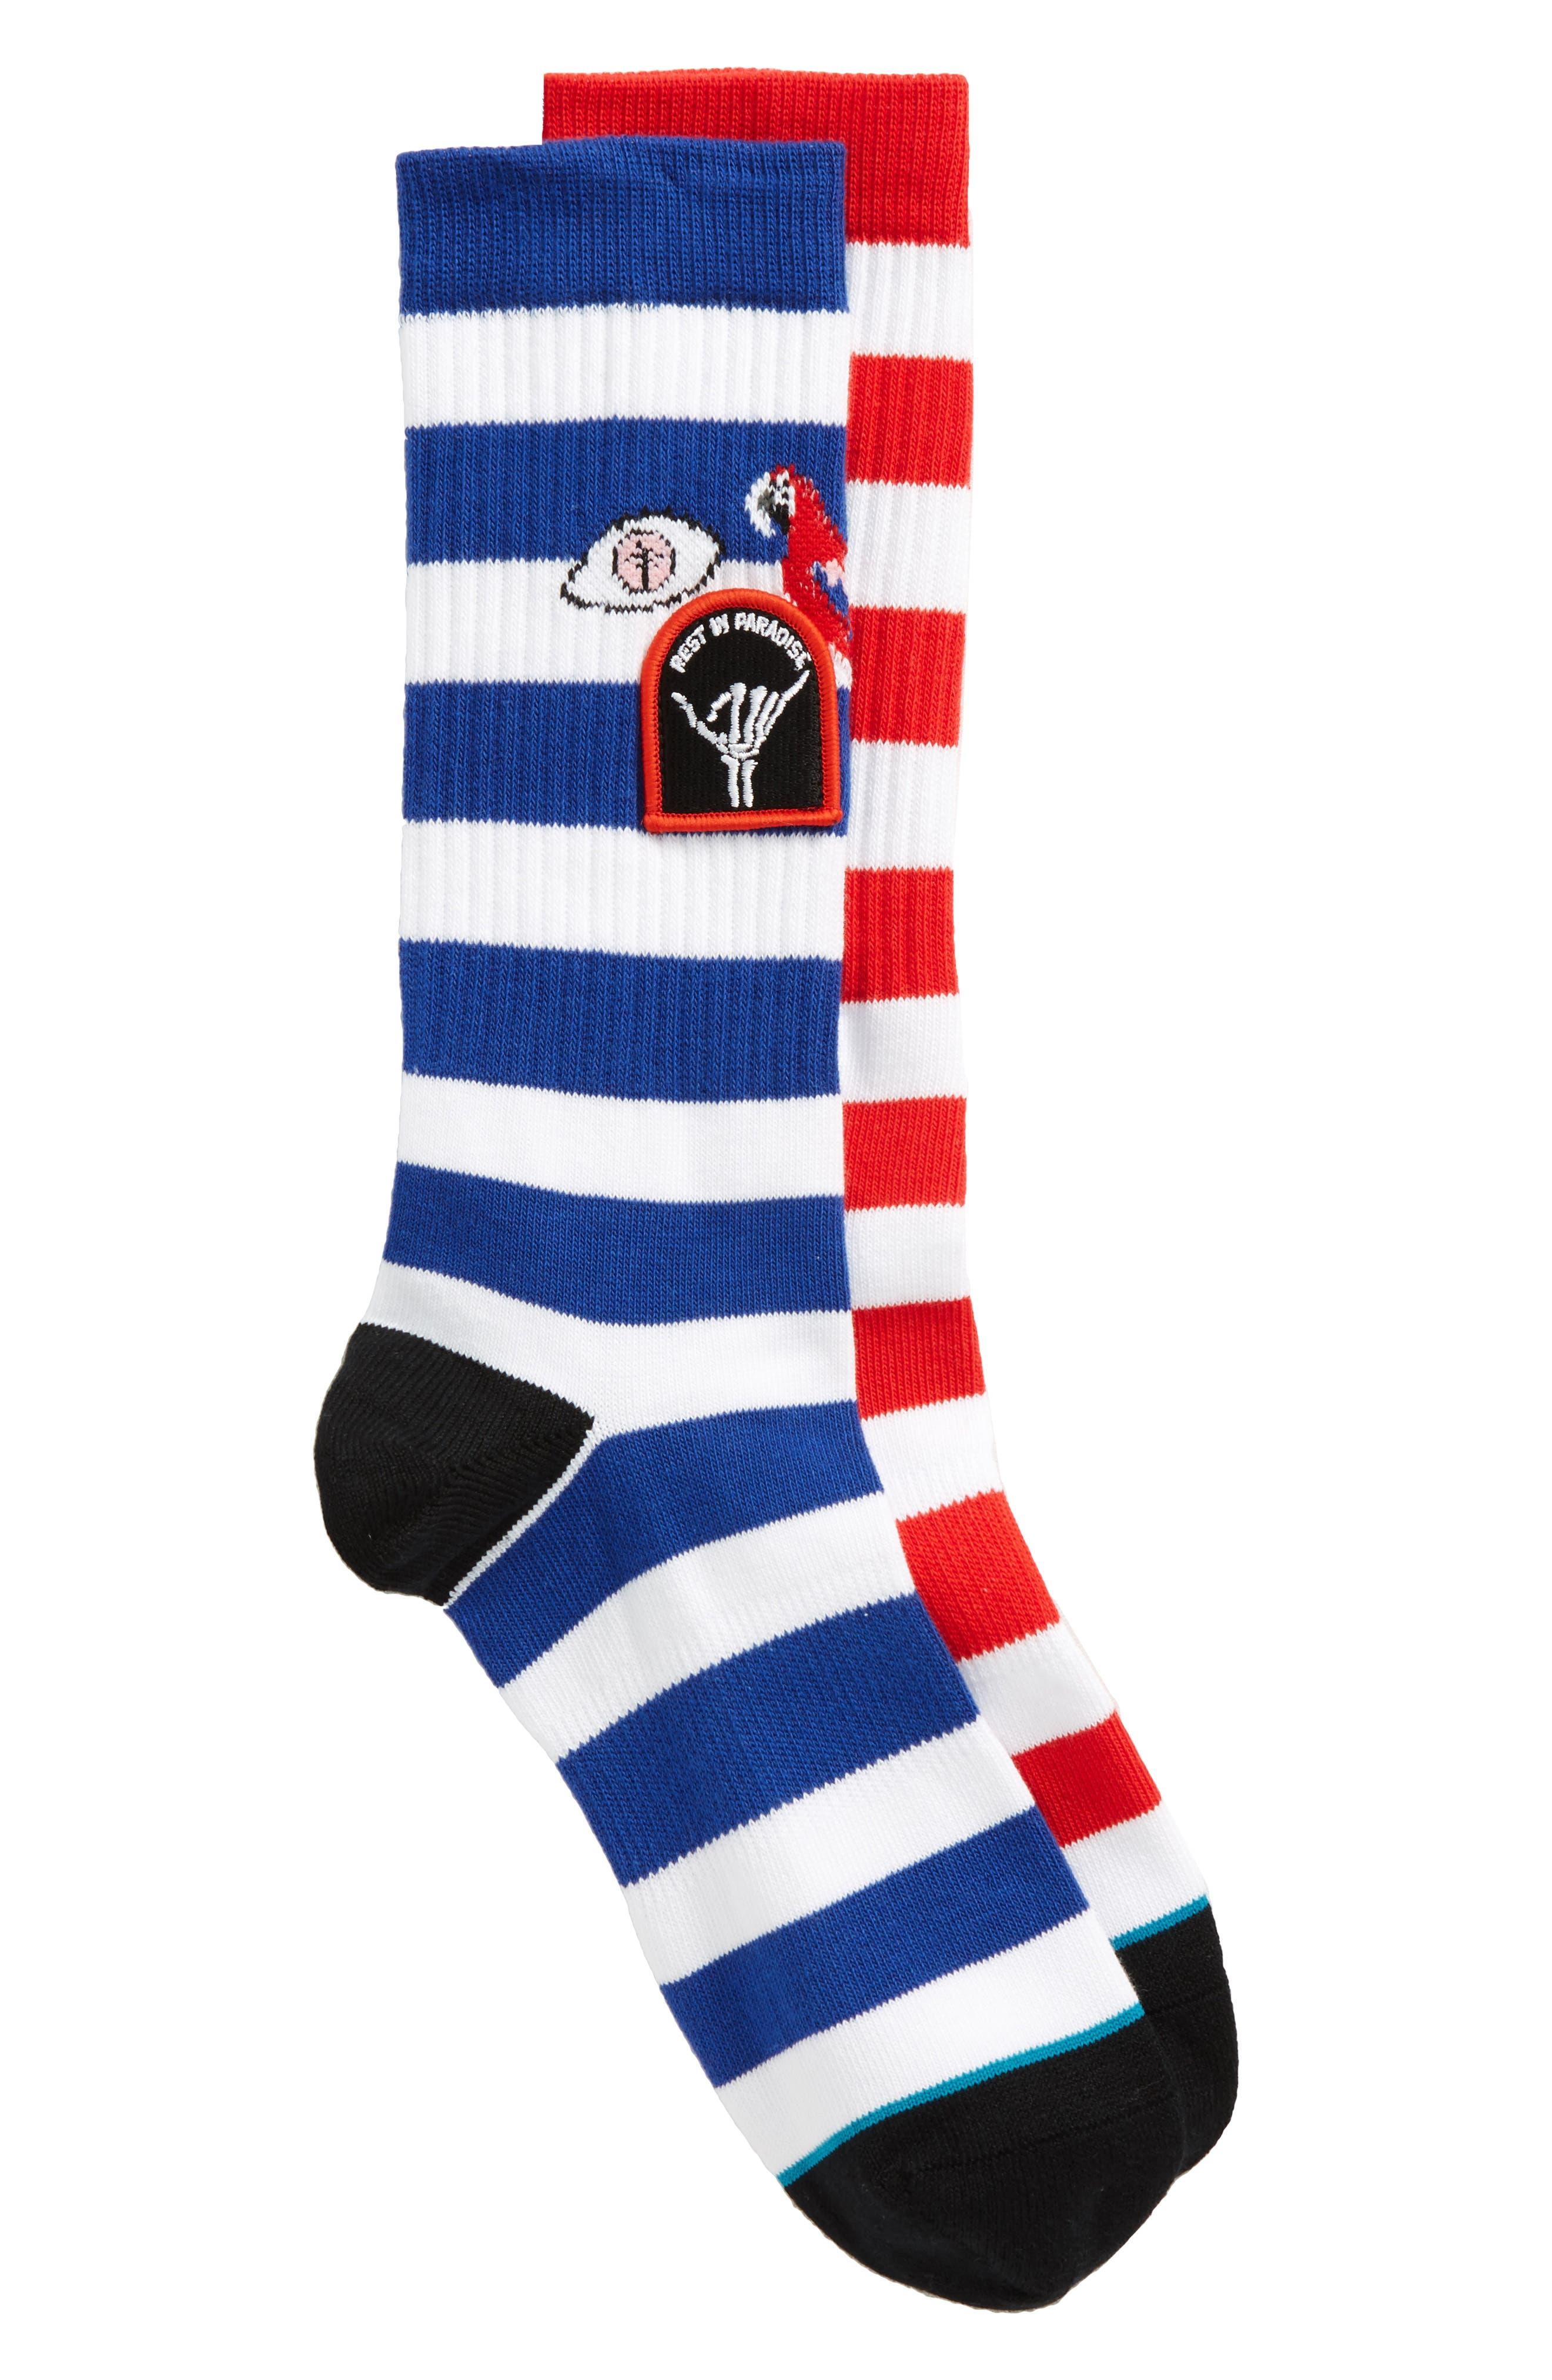 Staycation Stripe Socks,                             Main thumbnail 1, color,                             Blue